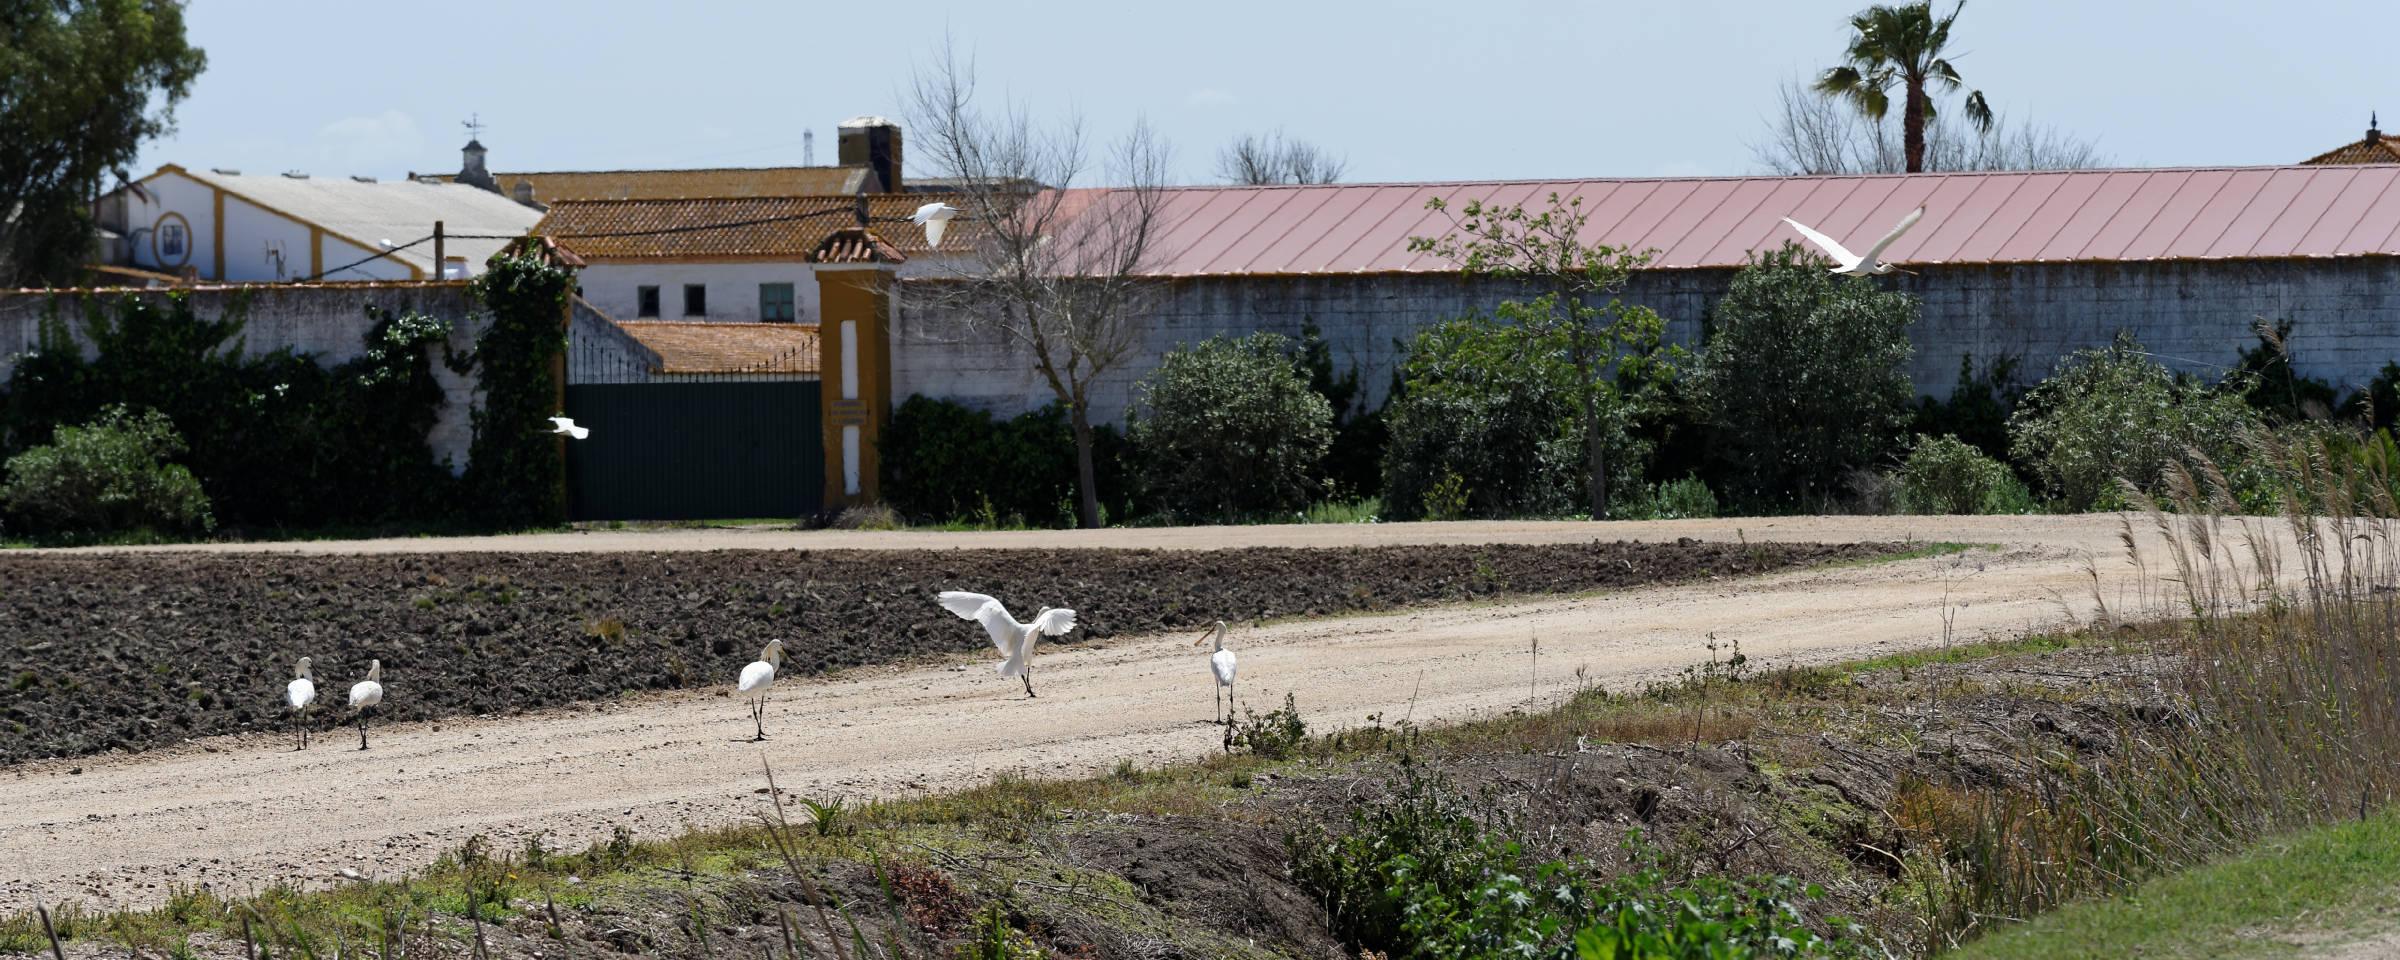 160414-Isla minima - Escobar (Andalousie) (33)